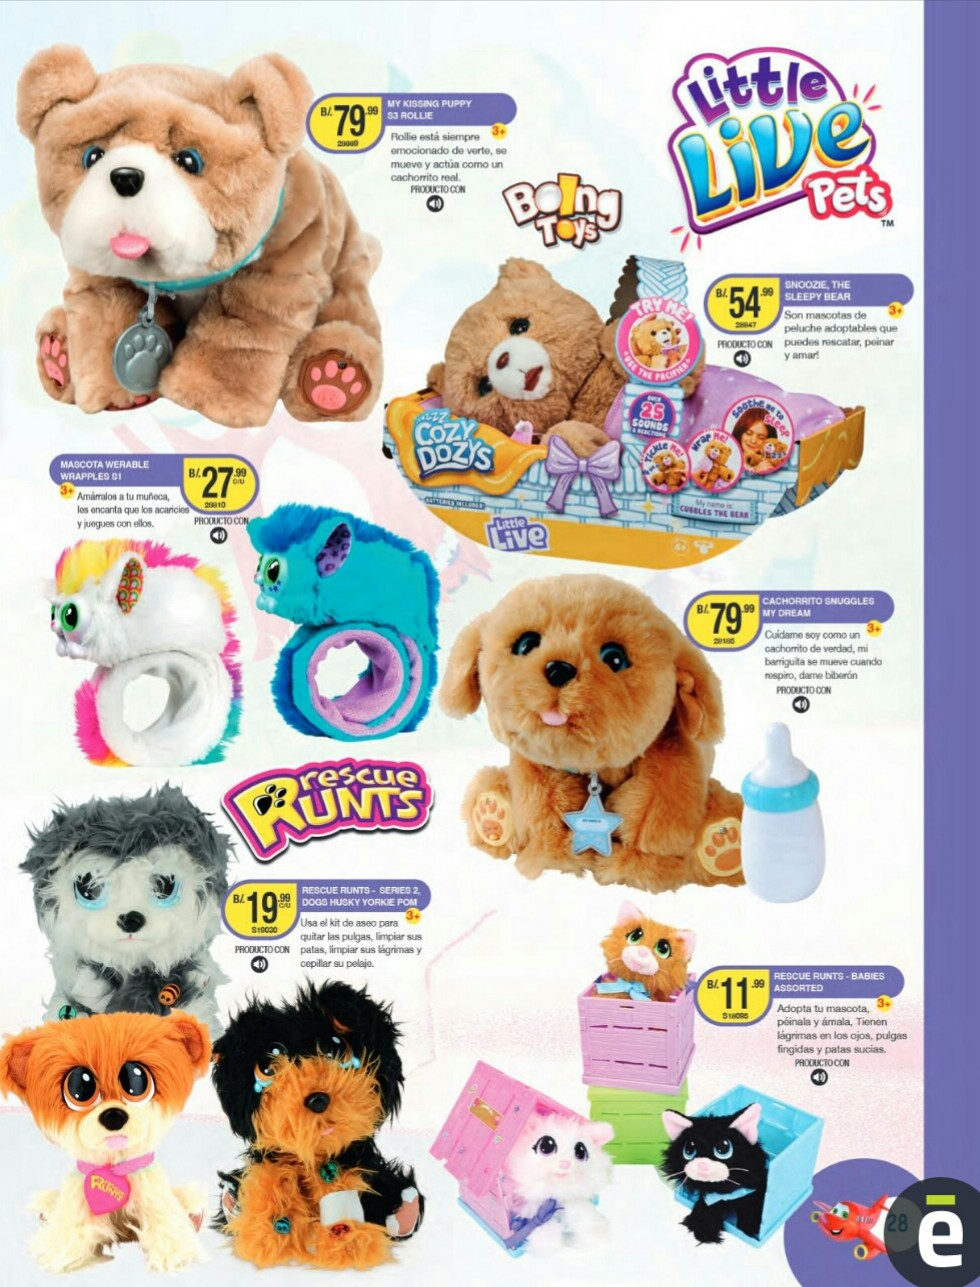 Catalogo juguetes Titan Toys 2019 p28